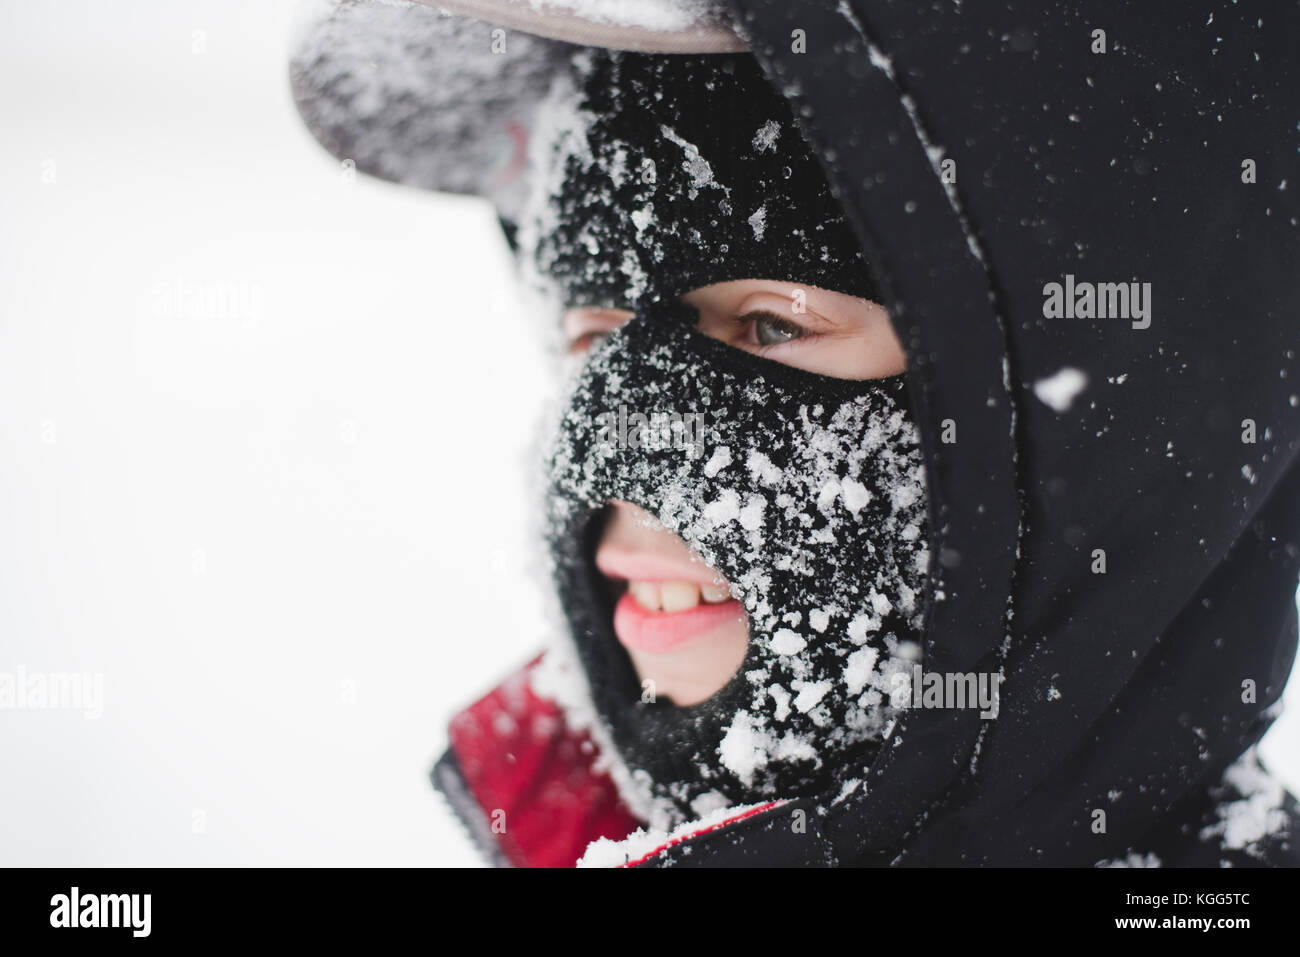 Kind trägt einen Ski Maske im Schnee Stockbild